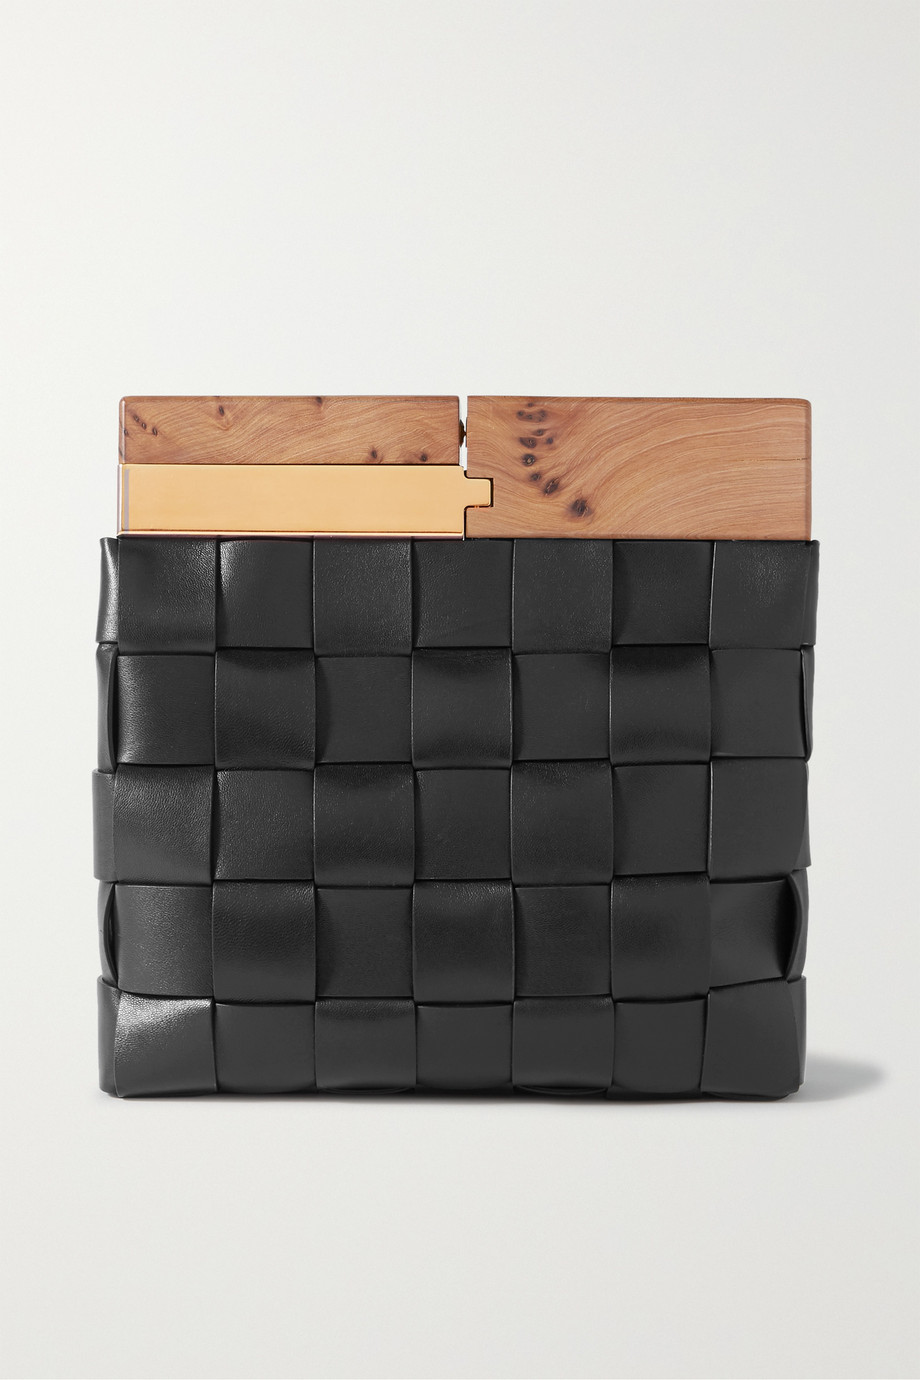 Bottega Veneta Wood intrecciato leather clutch